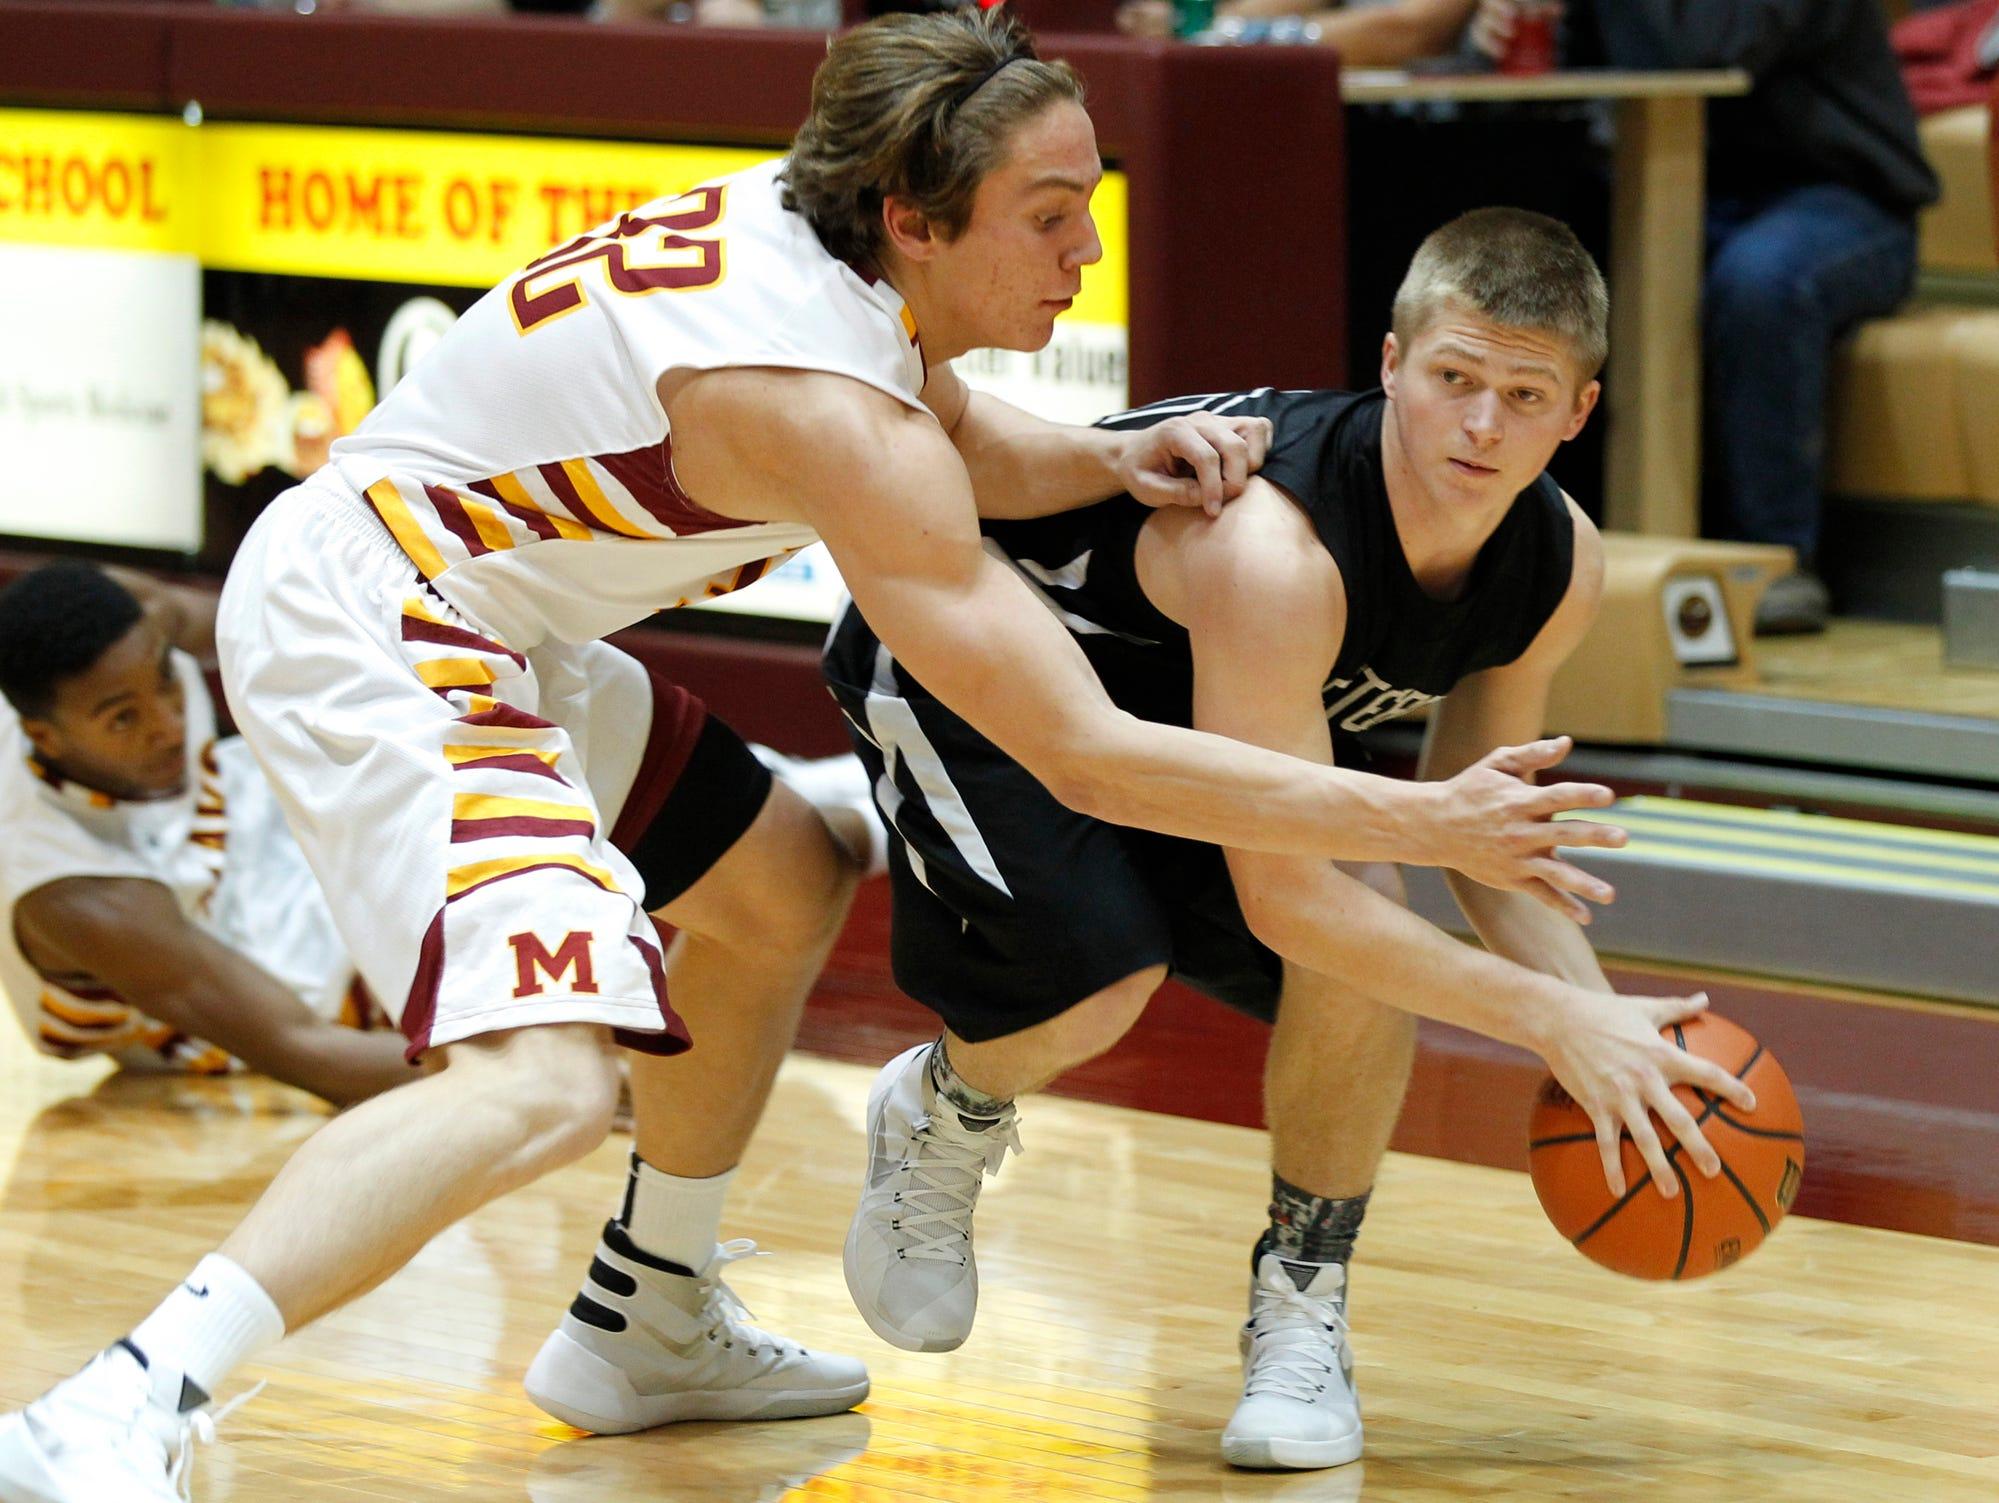 McCutcheon's Haden Deaton tries to steal the ball from Western's Josh Beeler Wednesday, November 25, 2015, at McCutcheon High School. McCutcheon clobbered Western 101-41.